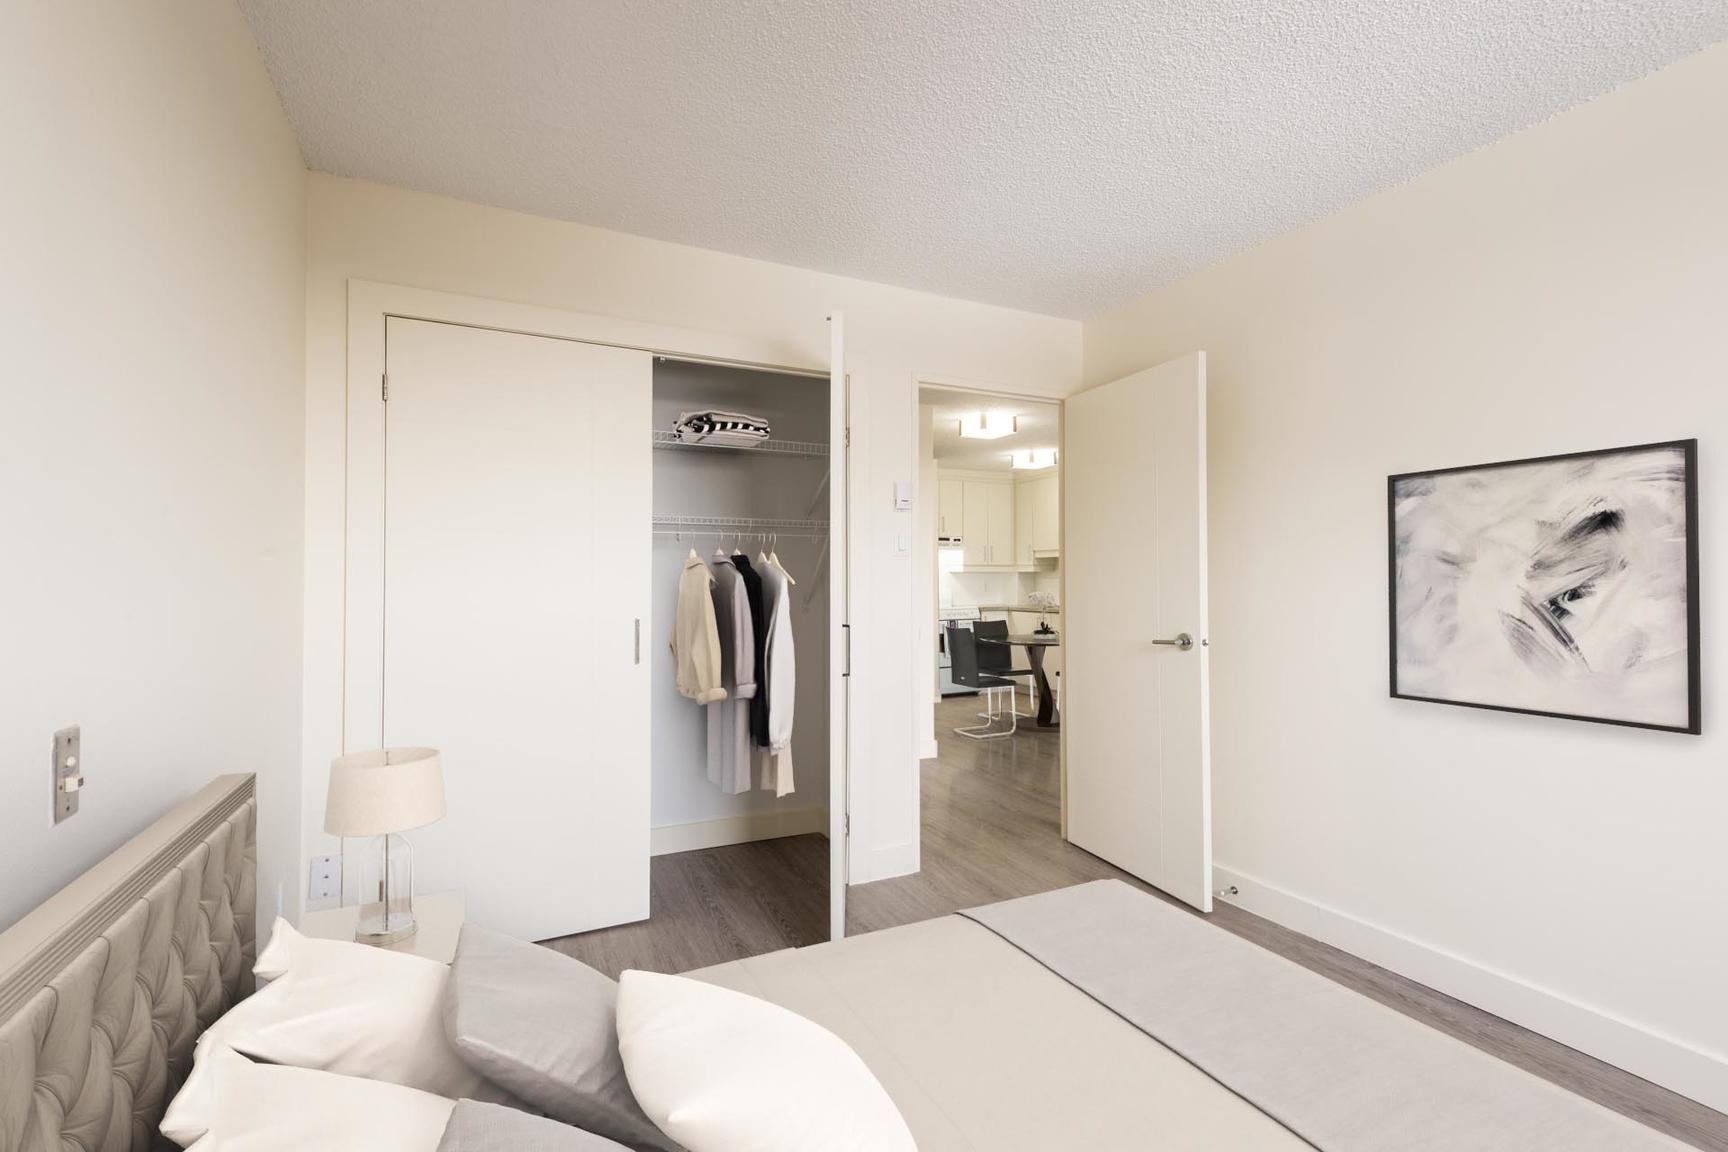 1 bedroom Apartments for rent in Laval at Le Quatre Cent - Photo 13 - RentQuebecApartments – L407184